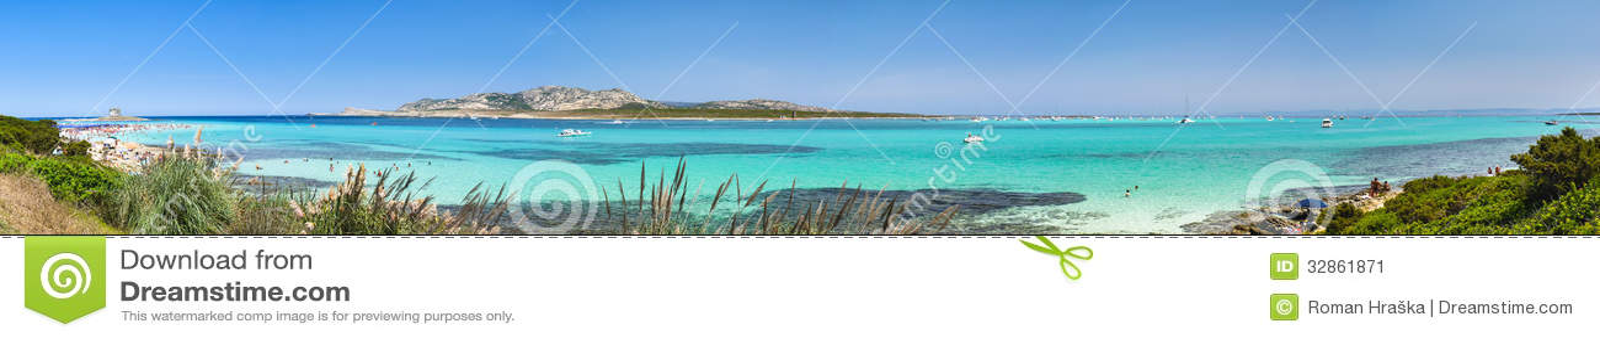 La Pelosa beach panorama